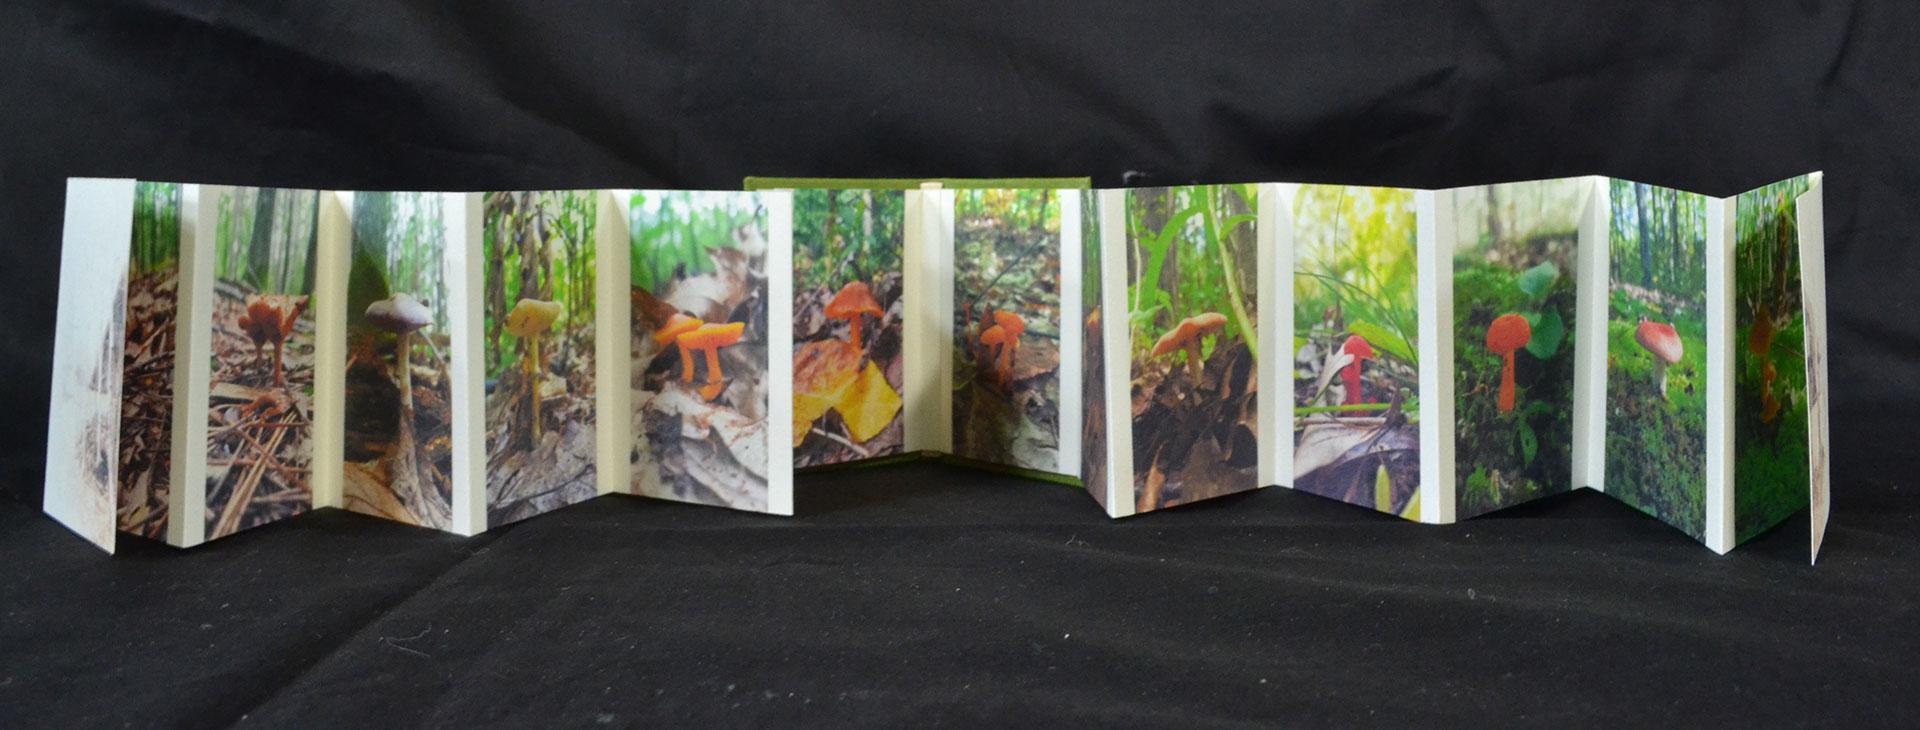 Erin K Schmidt, House in the Wood, Stratmore 130gsm, inkjet printed, wood, hemp, 2015, $20, Rochester Hills, MI